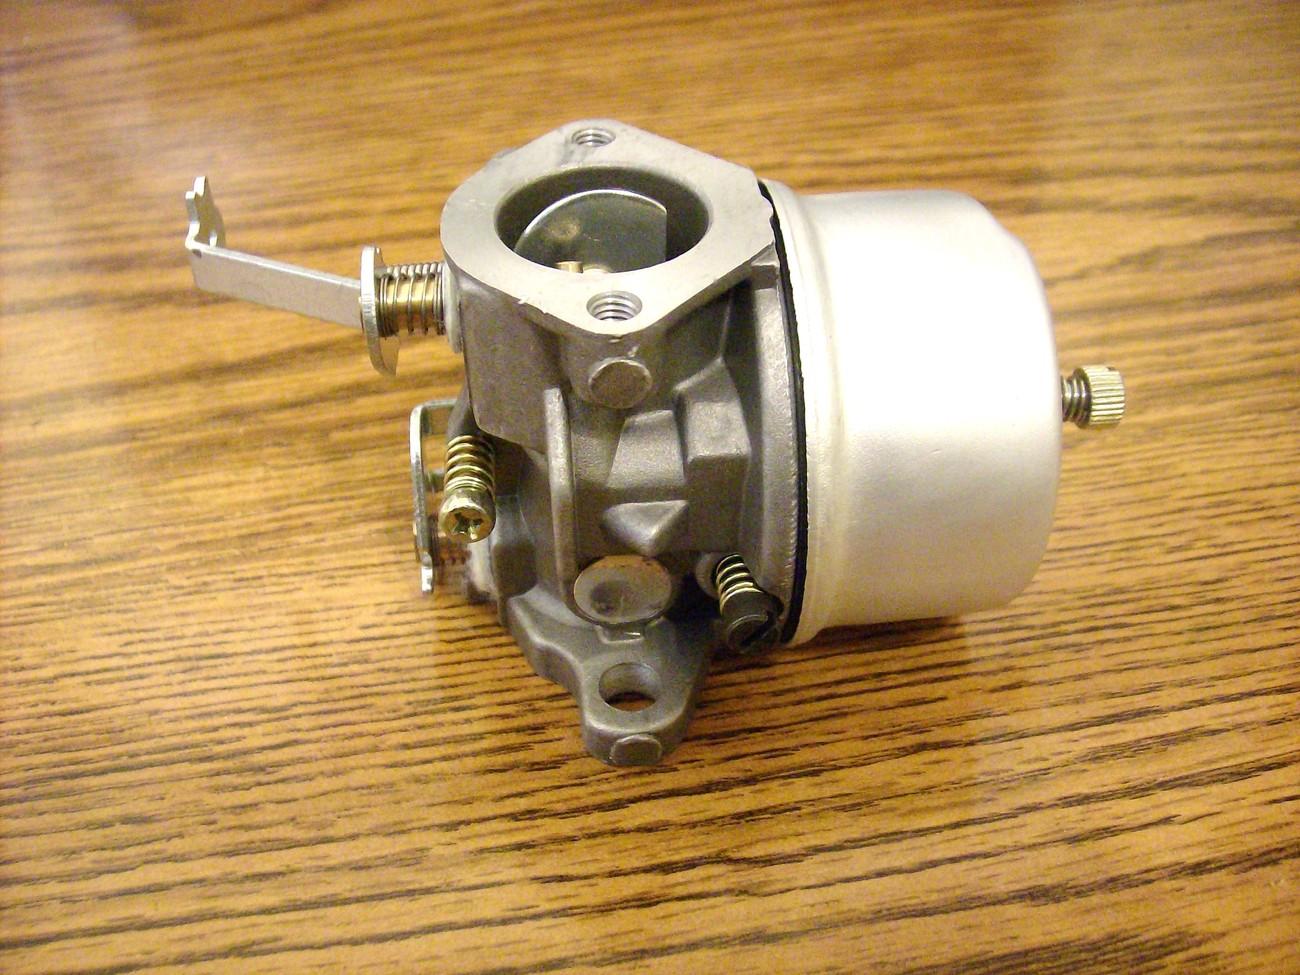 Carburetor Tecumseh H50, H60 HH60 Troy Bilt tiller 632230, 632178, 632272